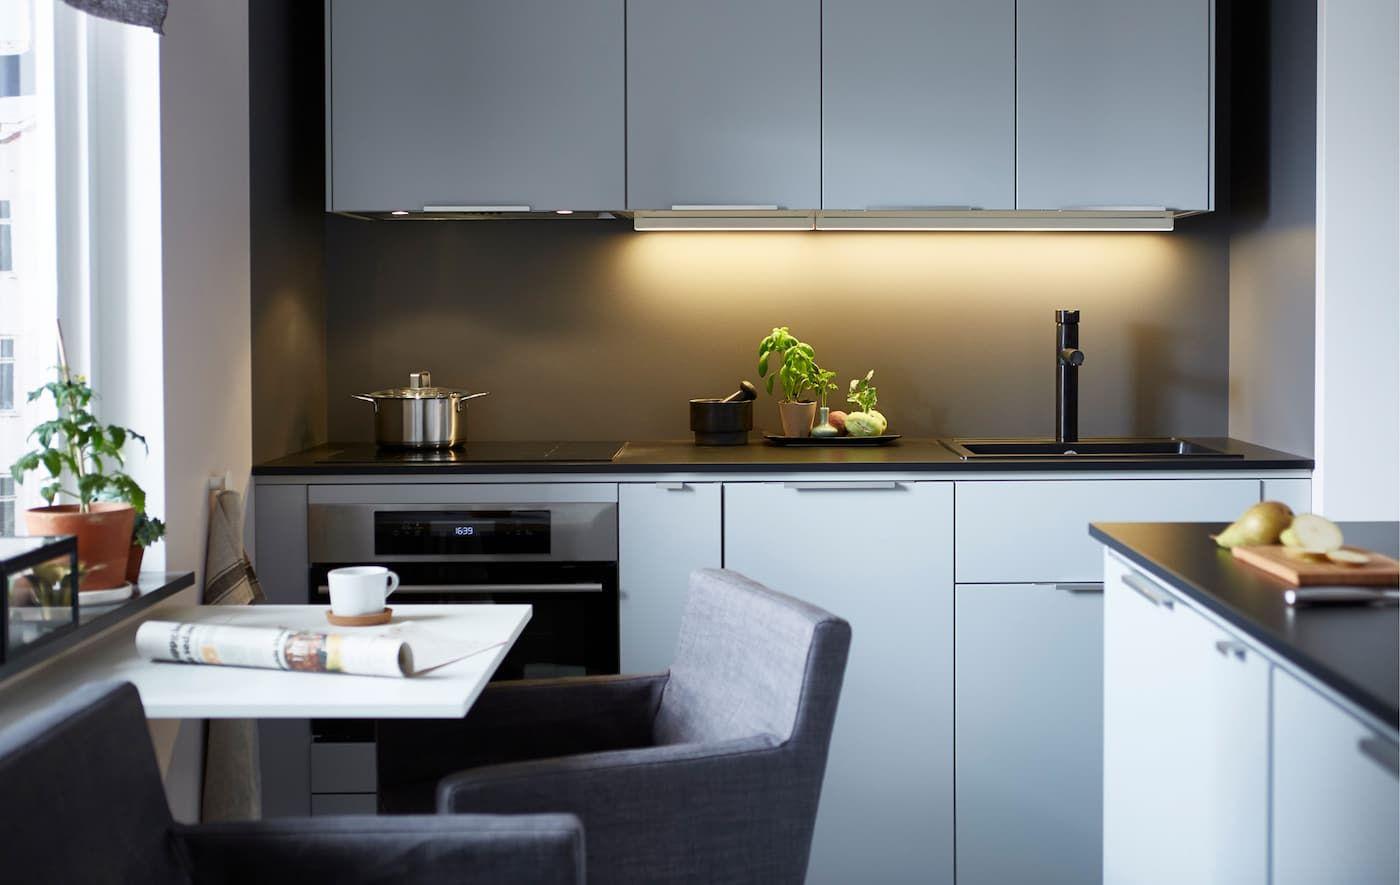 Maximise A Tiny Space Small Kitchen Ideas Small Kitchen Inspiration Ikea Small Kitchen Kitchen Inspirations